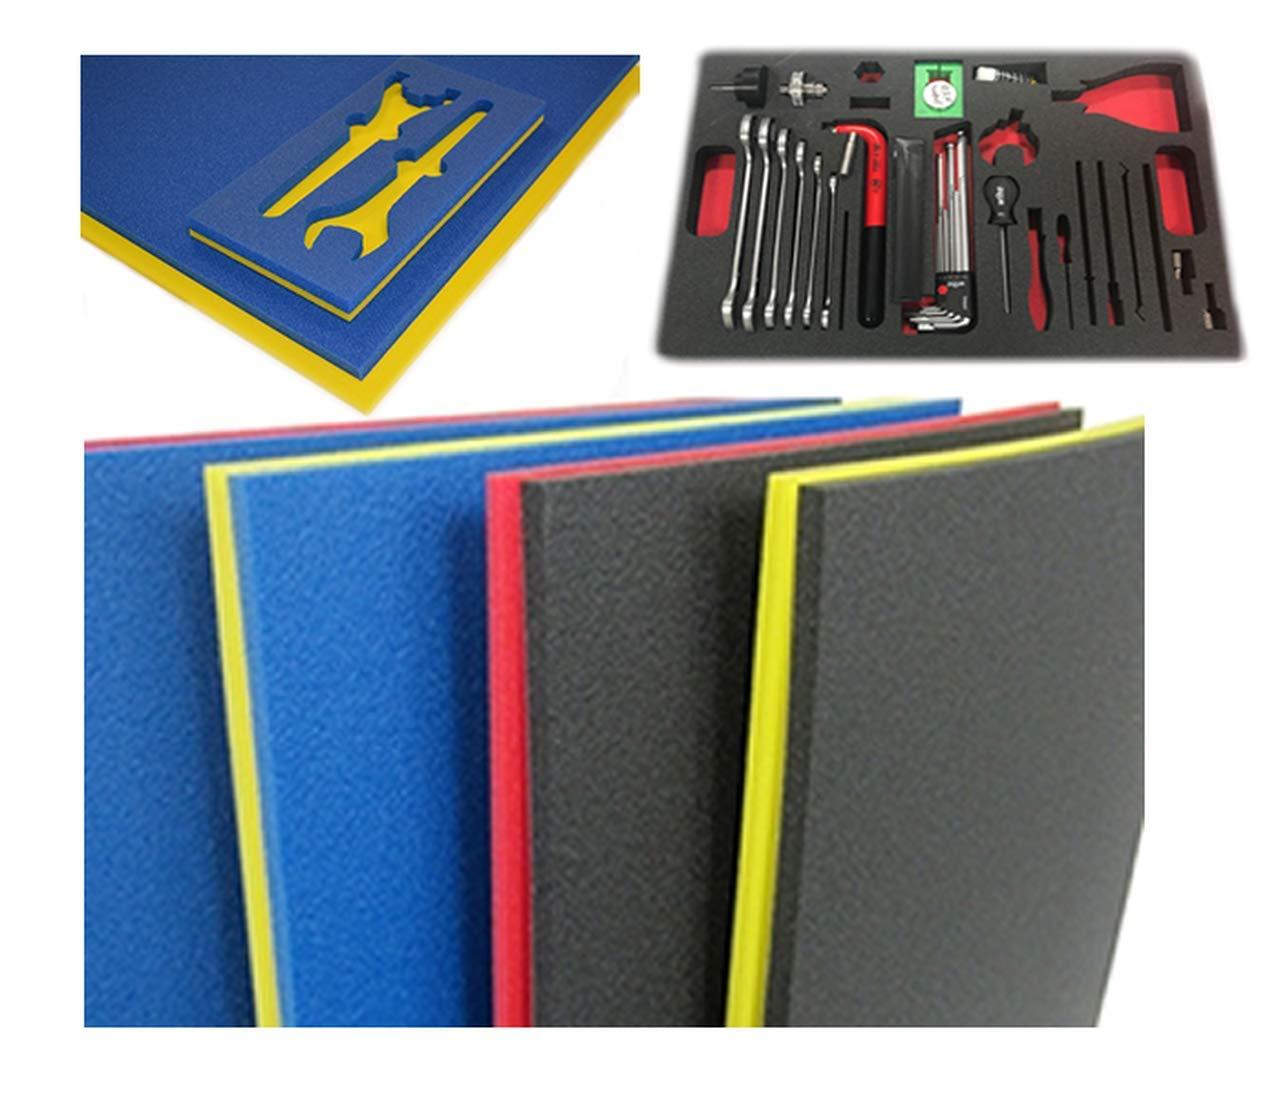 5S Tool Box Shadow Foam Organizers 2 Color Custom Size 26.25 x 39.75 , Blue Top Red Bottom